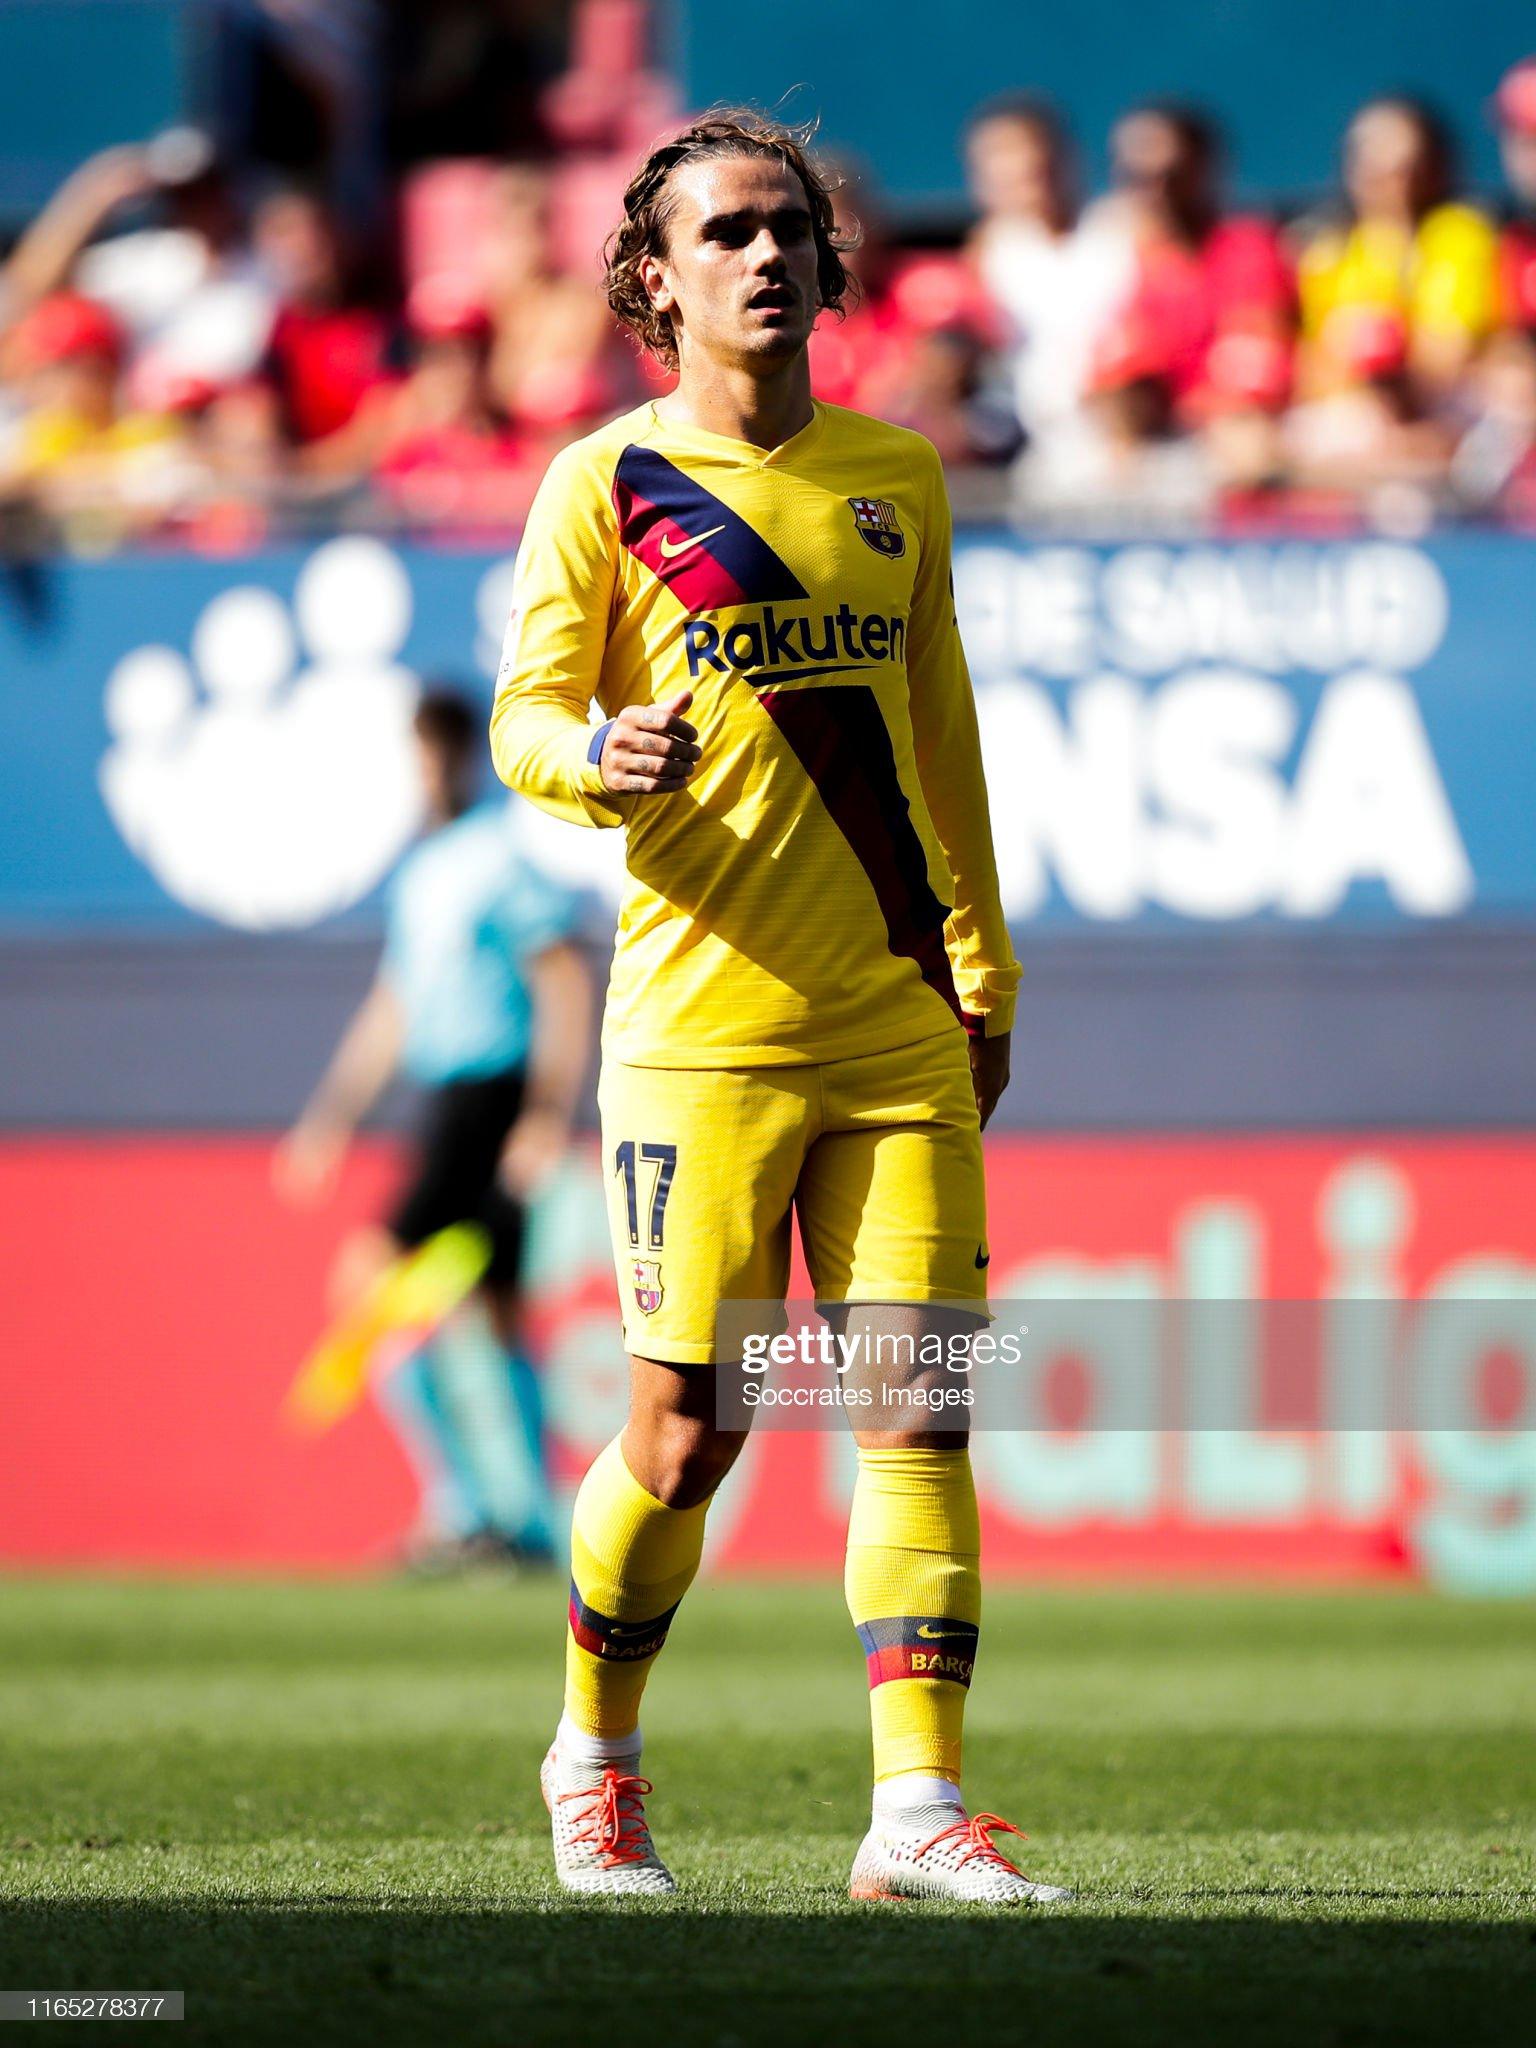 صور مباراة : أوساسونا - برشلونة 2-2 ( 31-08-2019 )  Antoine-griezmann-of-fc-barcelona-during-the-la-liga-santander-match-picture-id1165278377?s=2048x2048